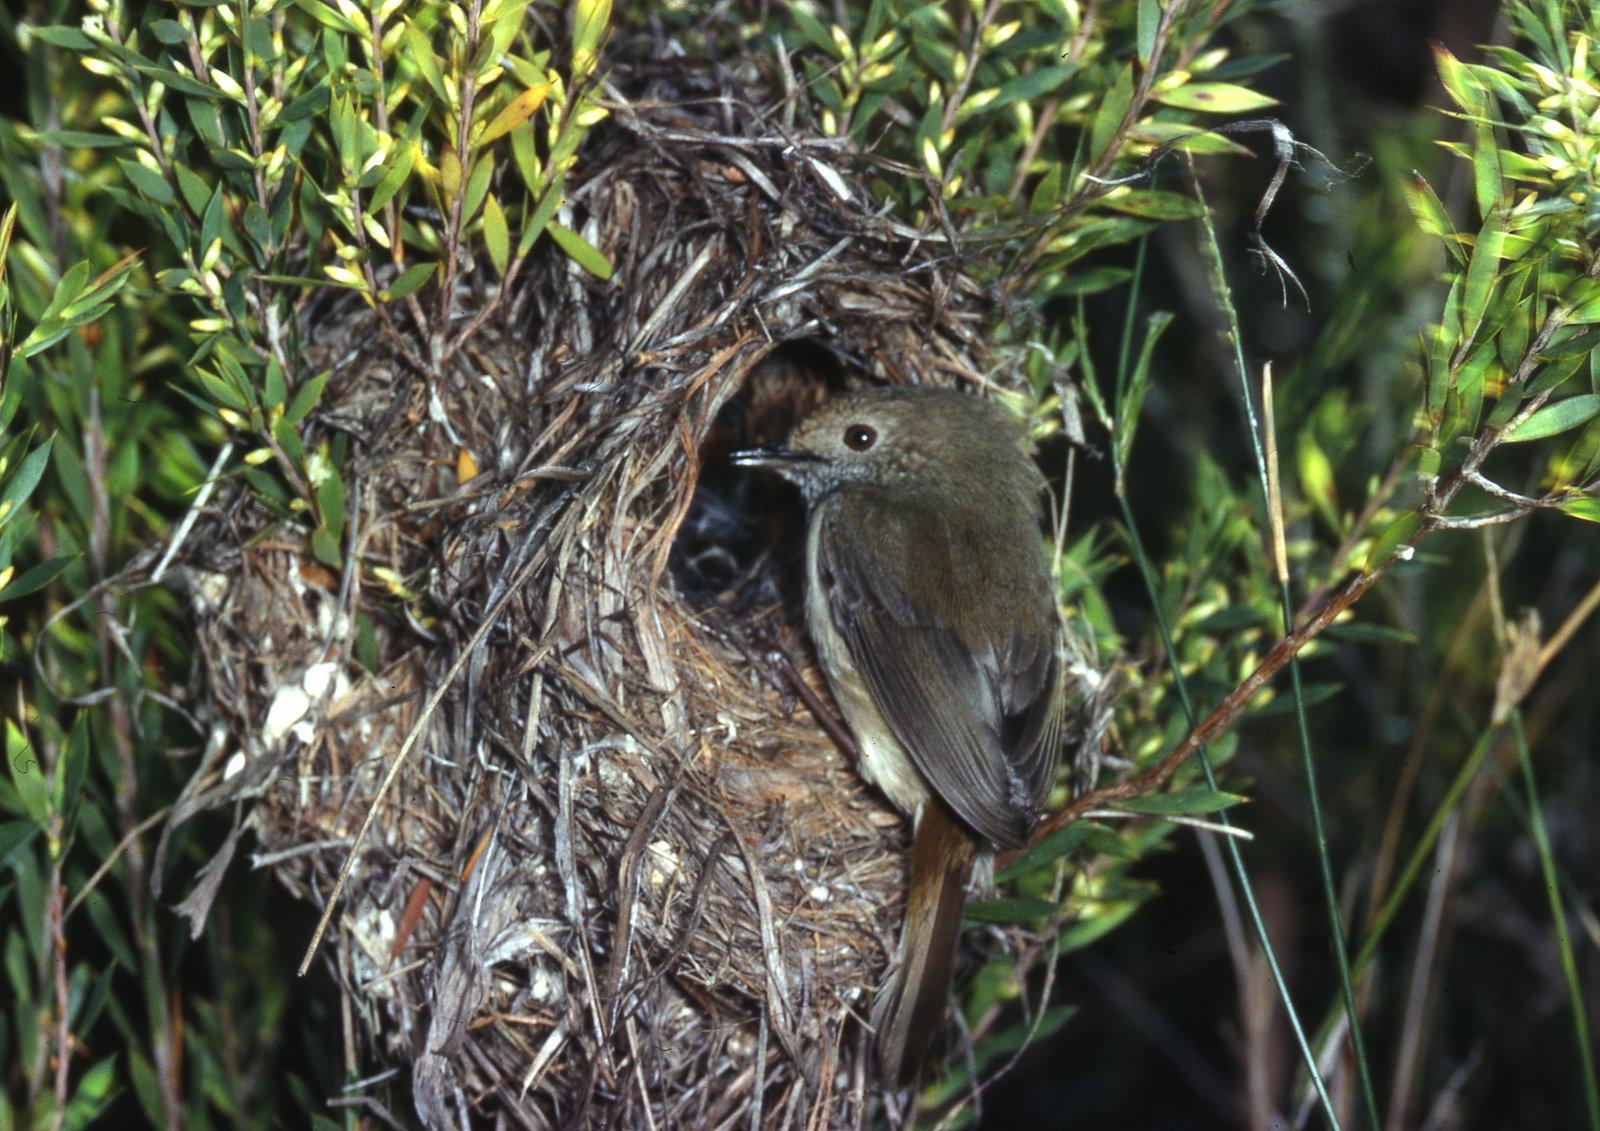 Brown Thornbill, Acanthiza pusilla